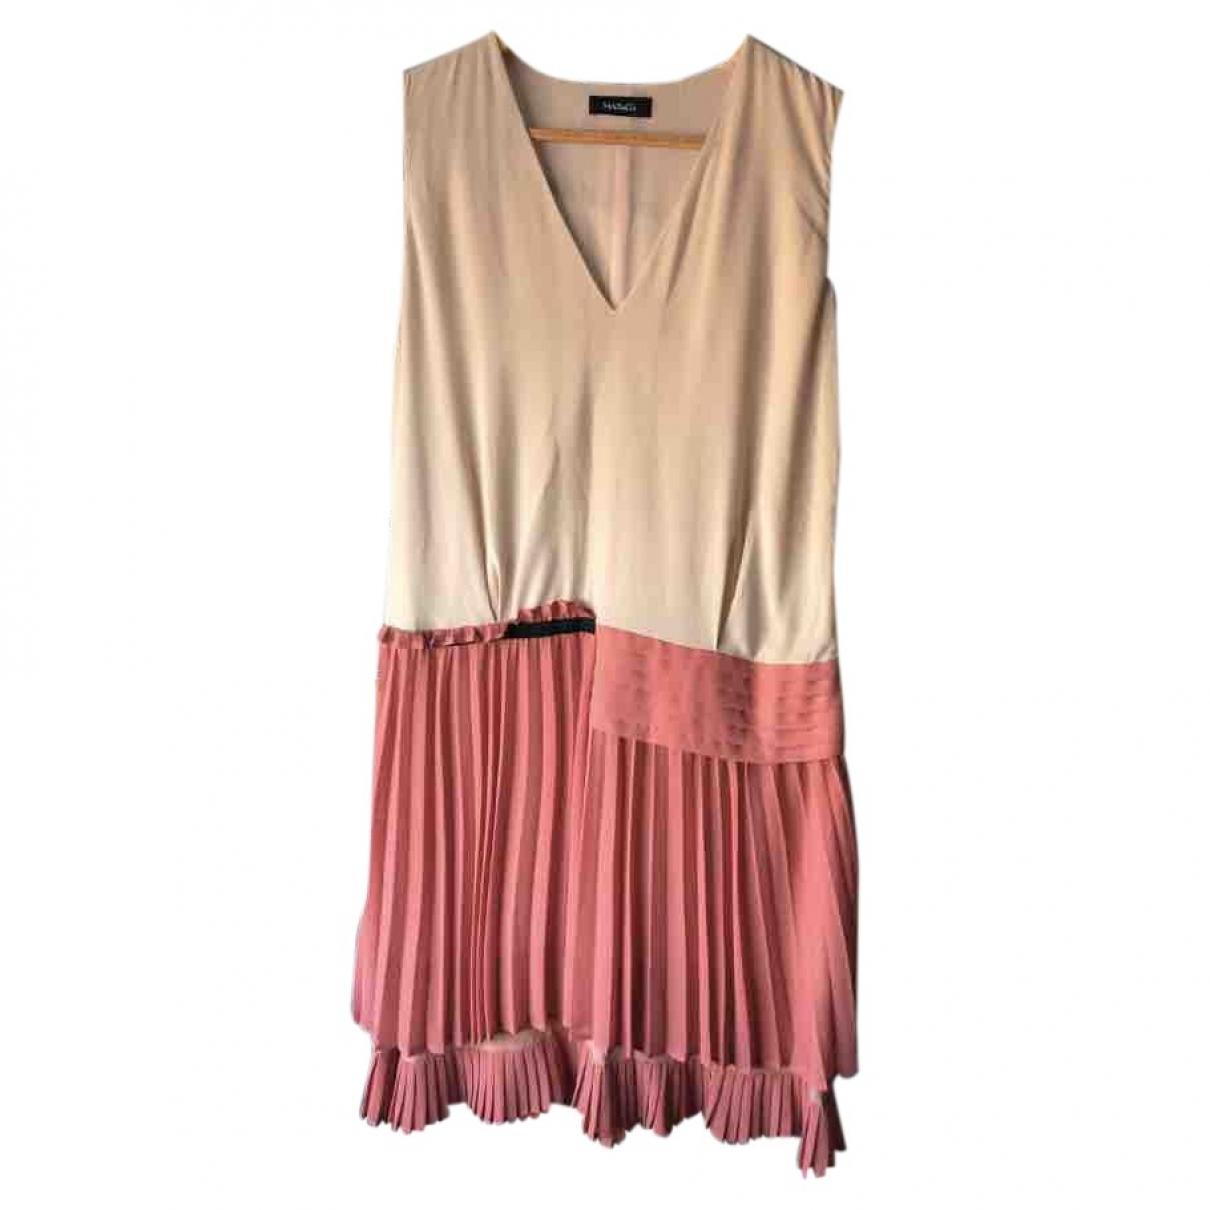 Max & Co \N Silk dress for Women M International